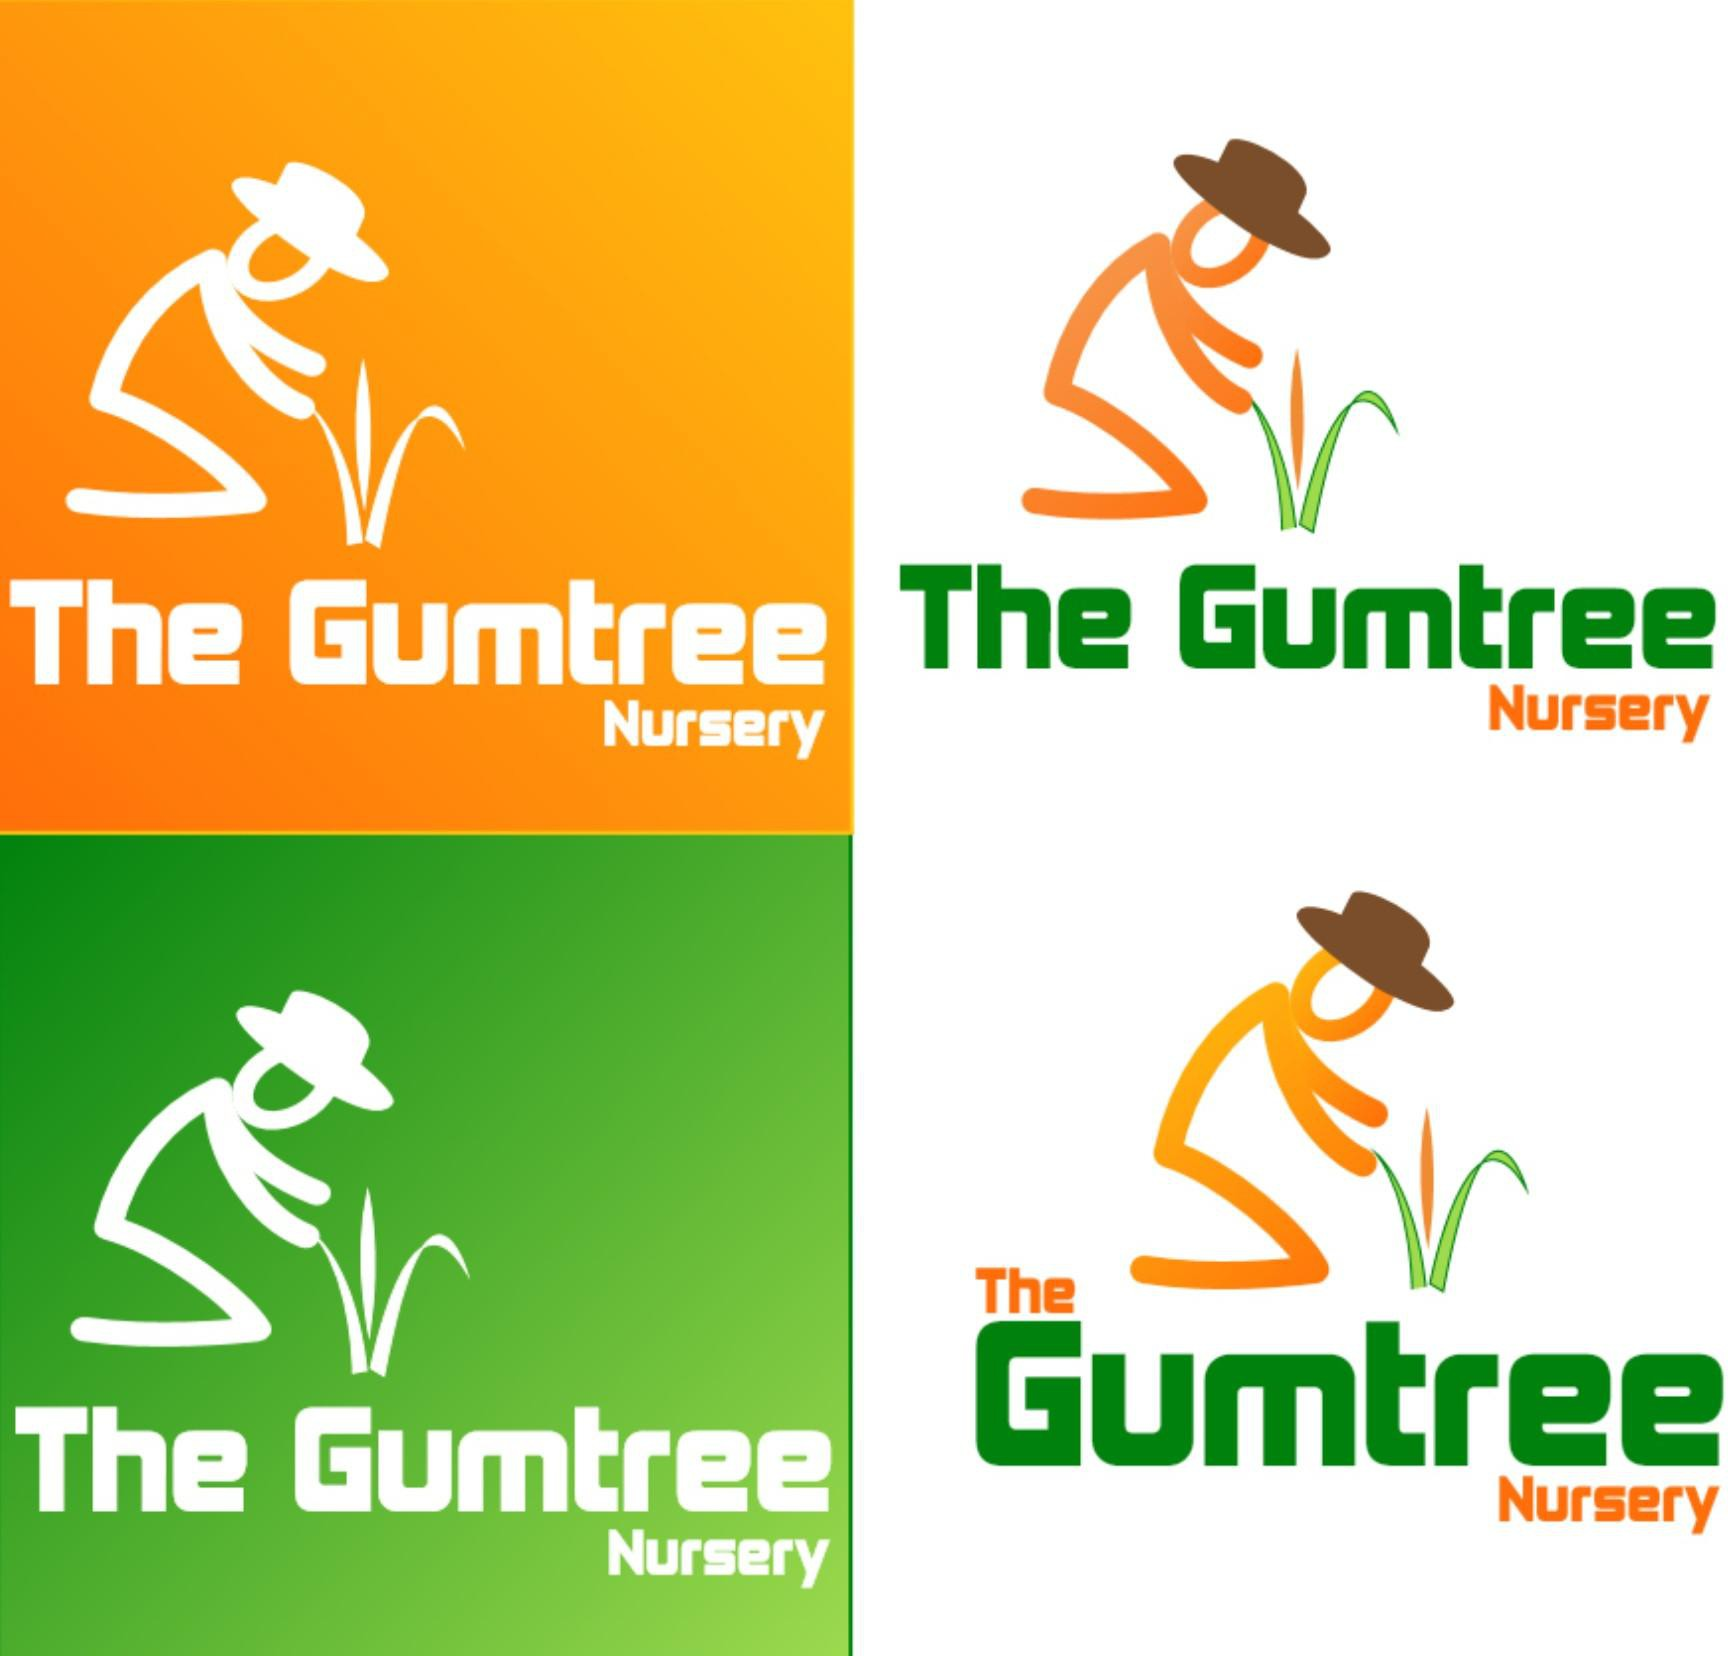 logo for The Gumtree Nursery